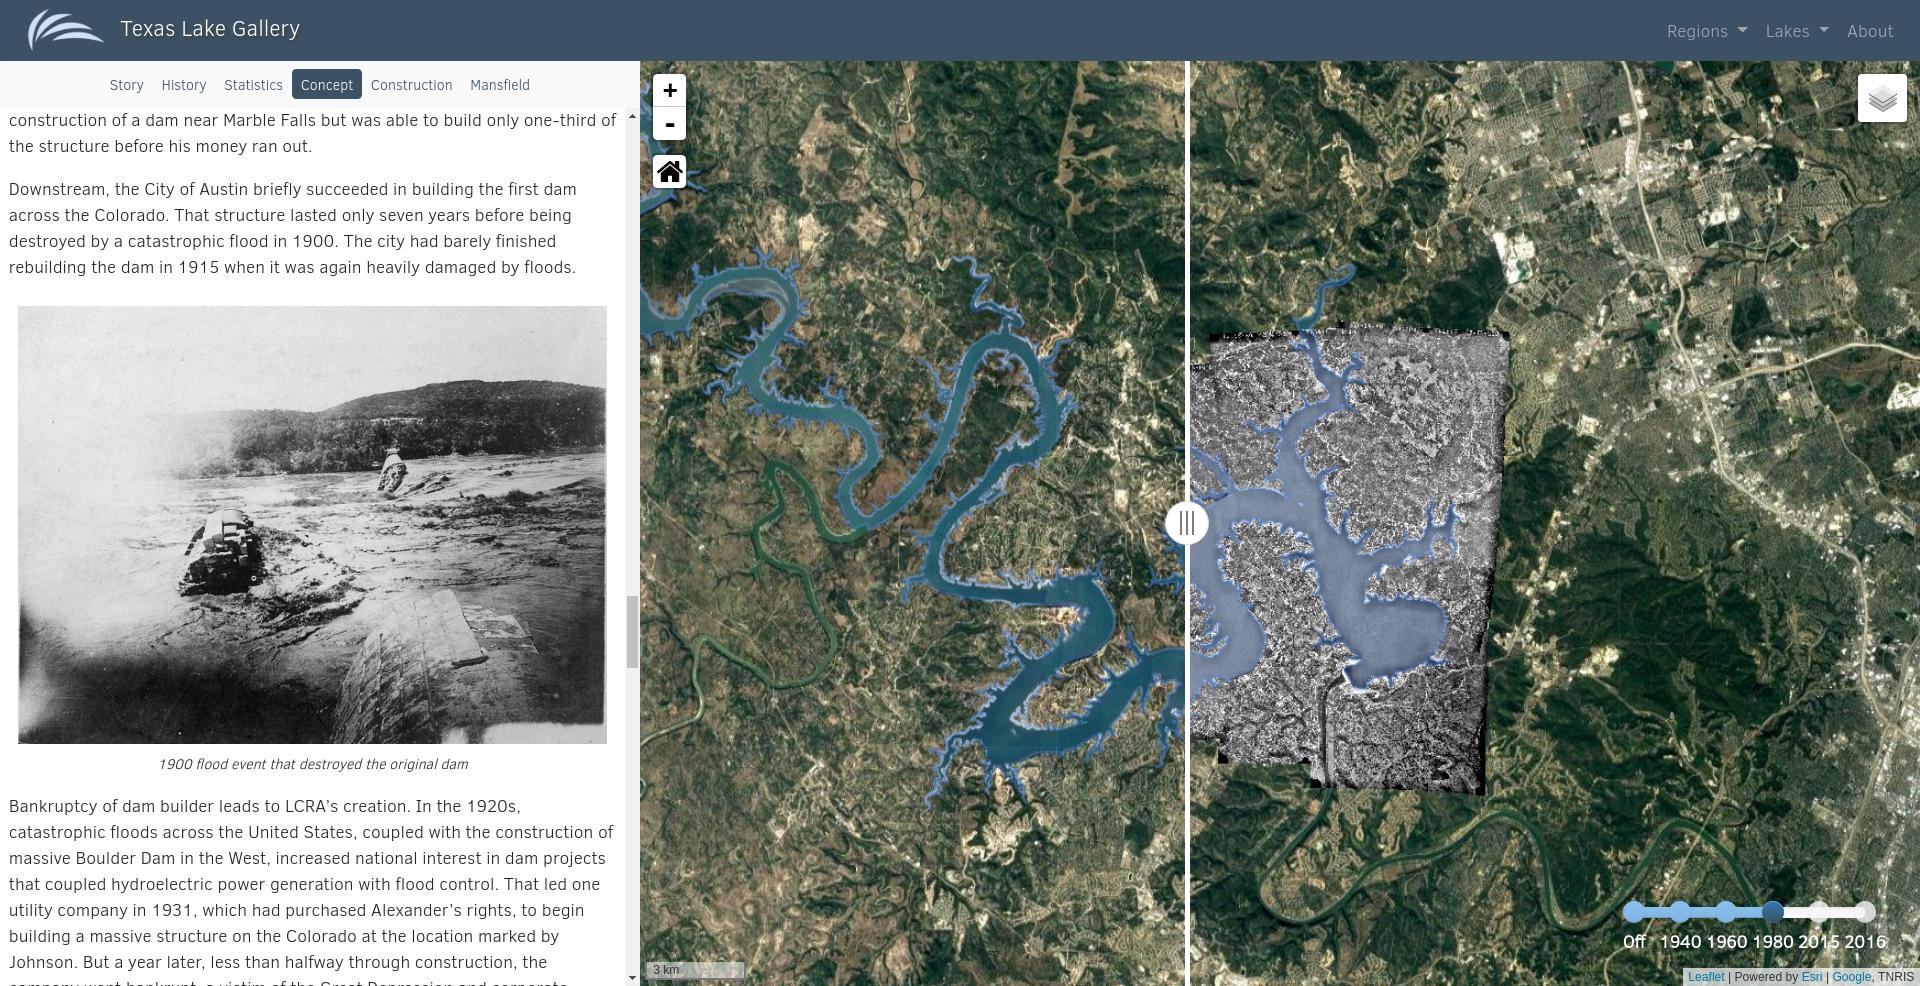 Lake of Texas Screenshot